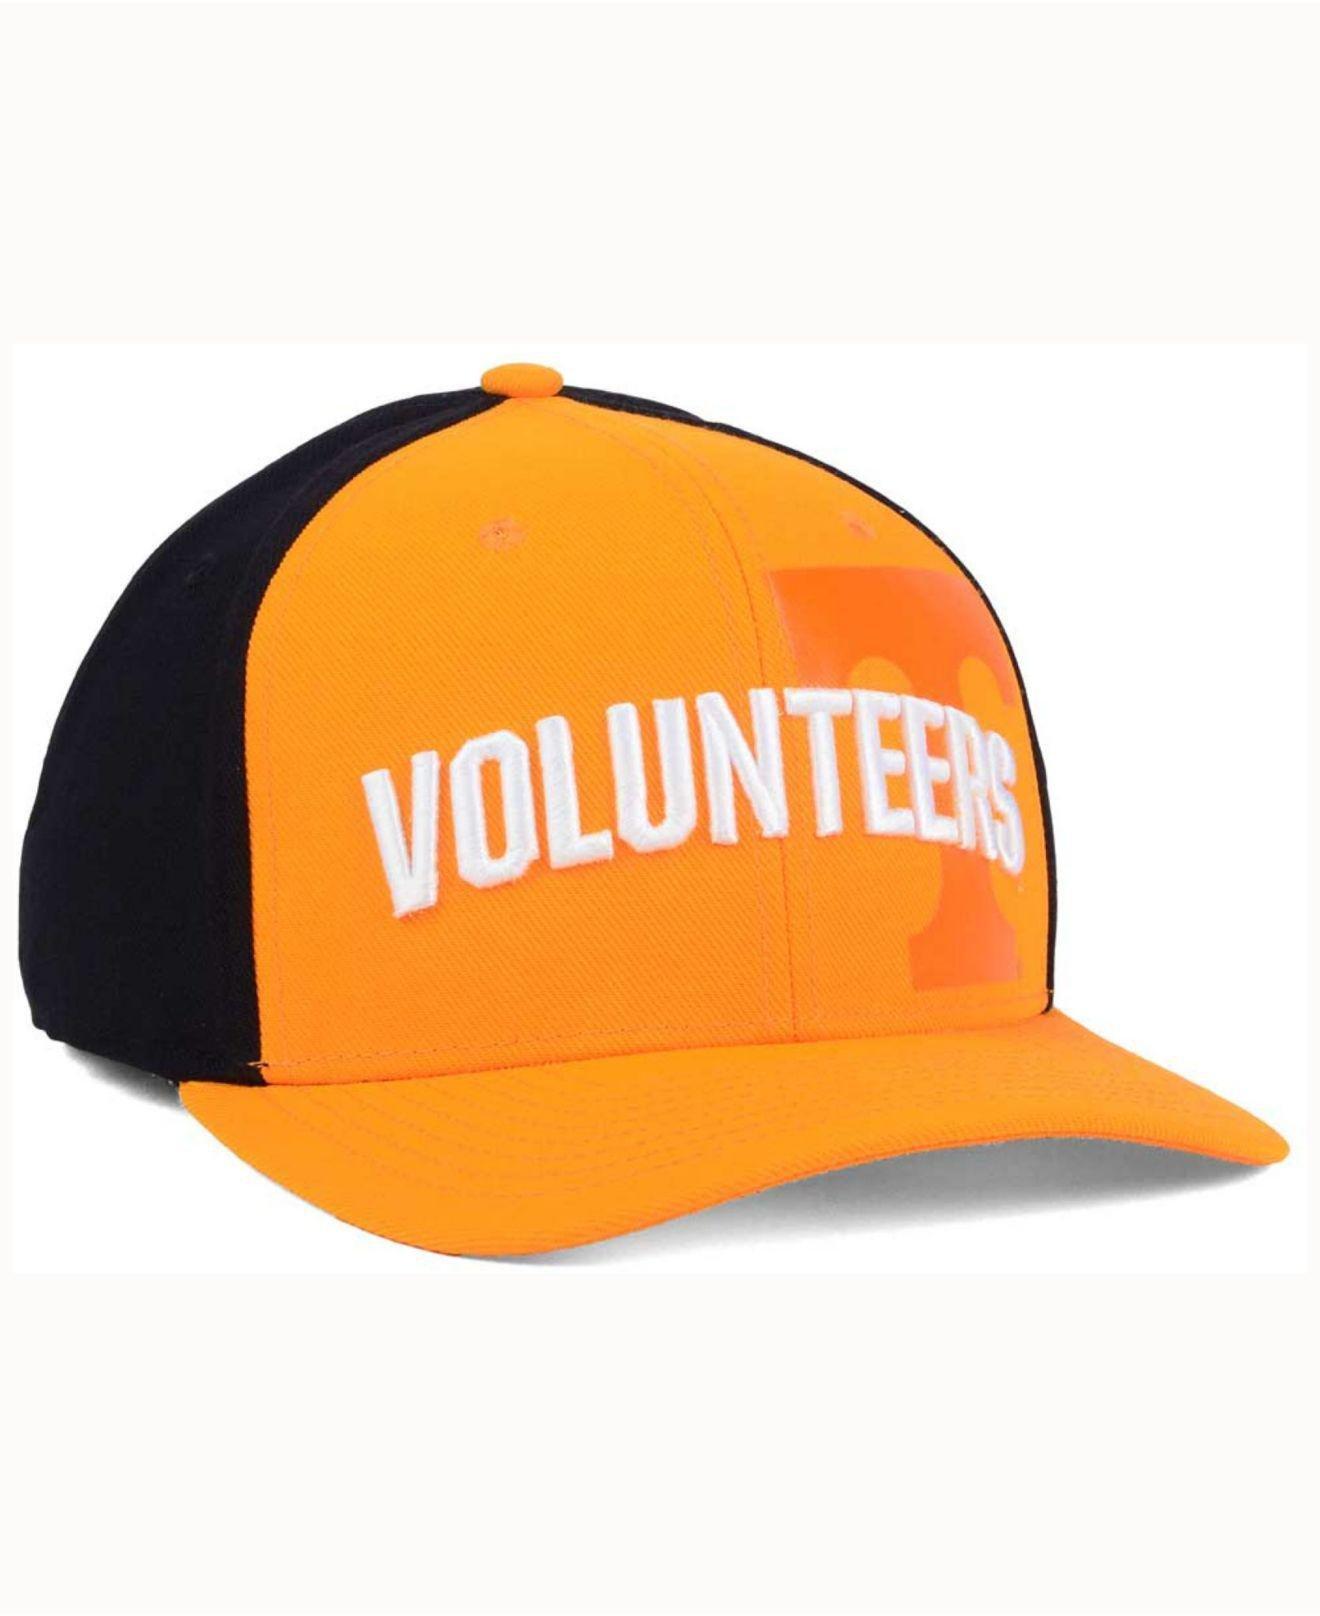 bdd5995901e Lyst - Nike Tennessee Volunteers Classic 99 Swoosh Flex Cap in ...